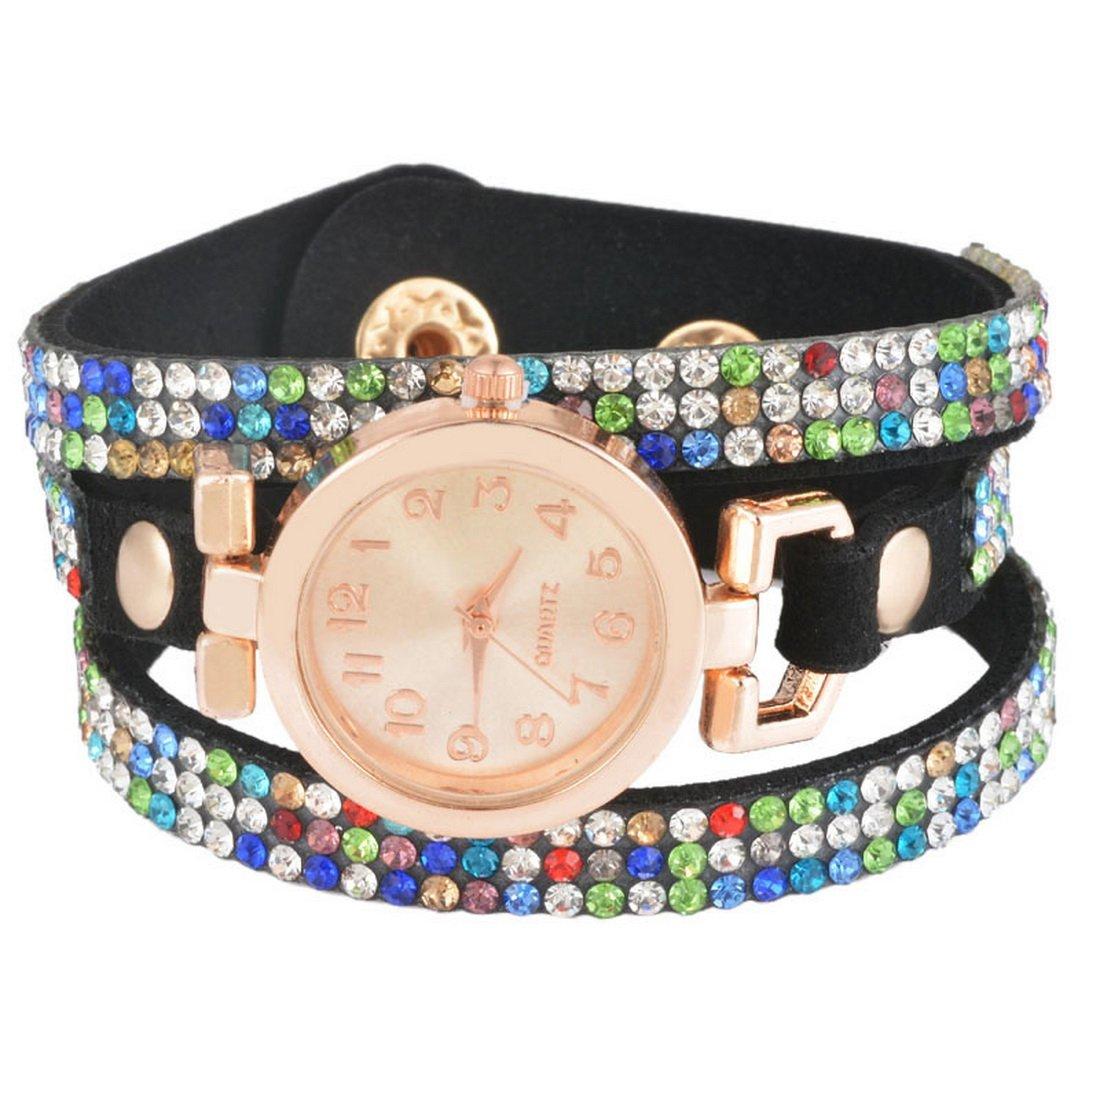 db96cdb3fd9142 MJARTORIA Damen Strass Boho Armbanduhr Elegant Klein Mode Damenuhr Analog  Quarz Uhr Schwarz: Amazon.de: Uhren